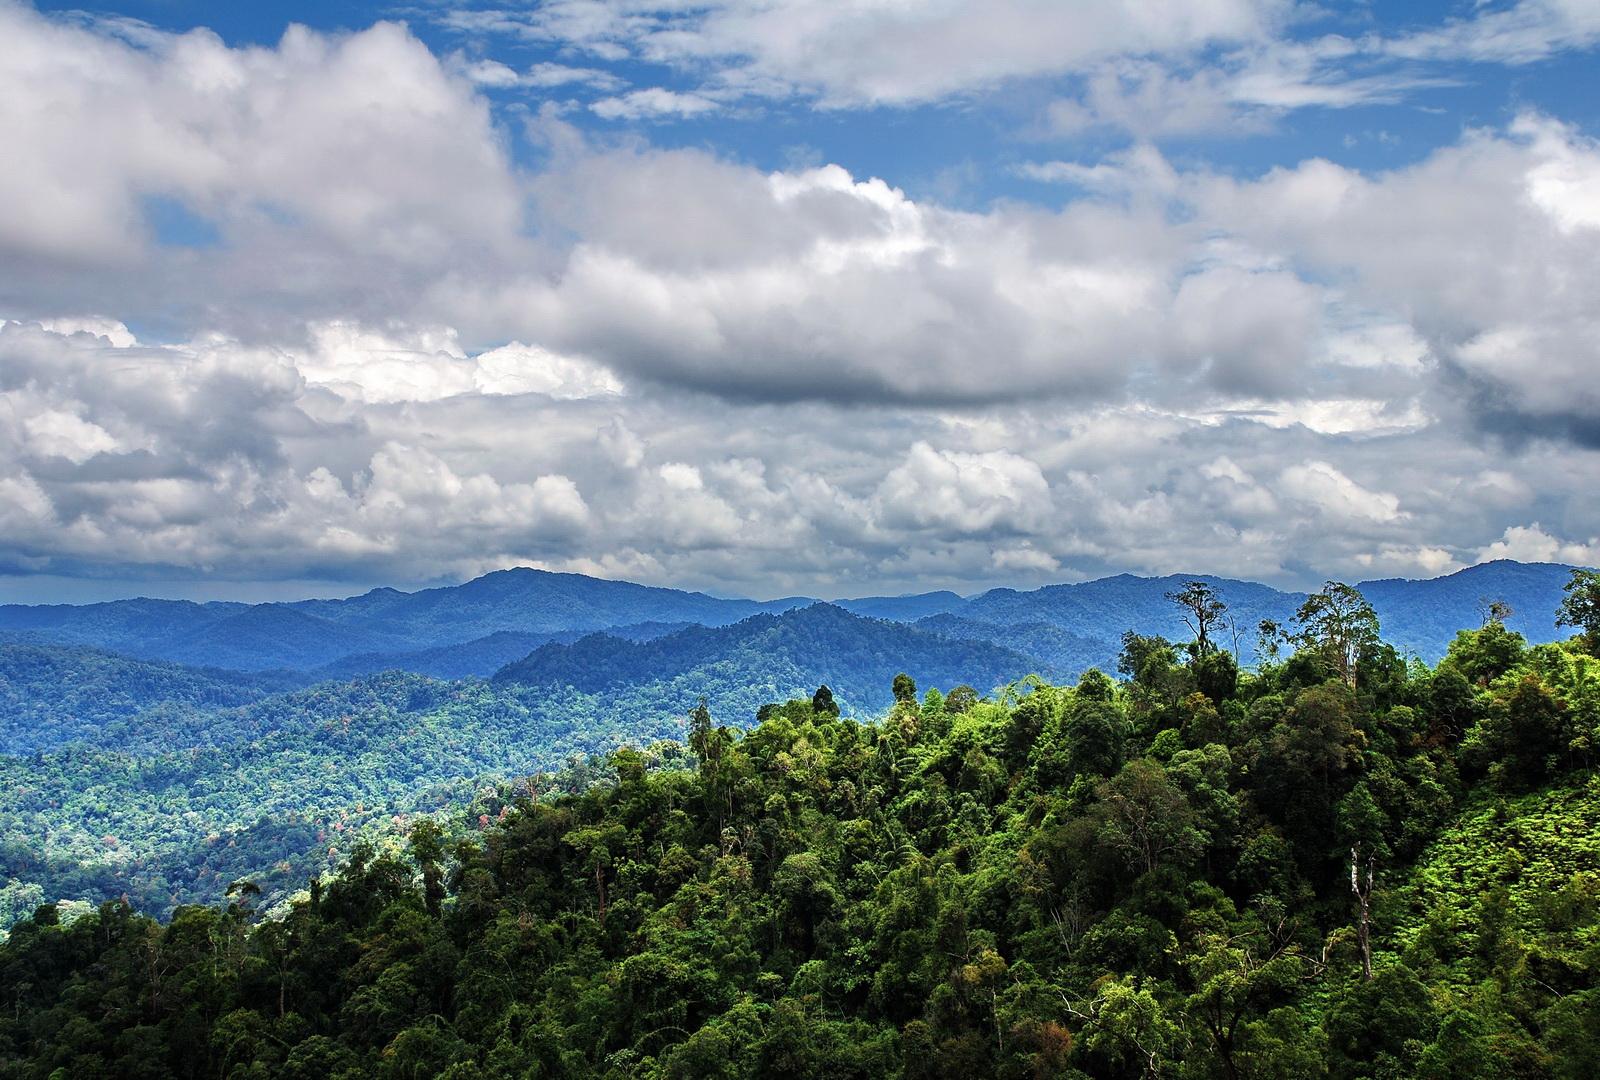 Malaysia, Belum Forest